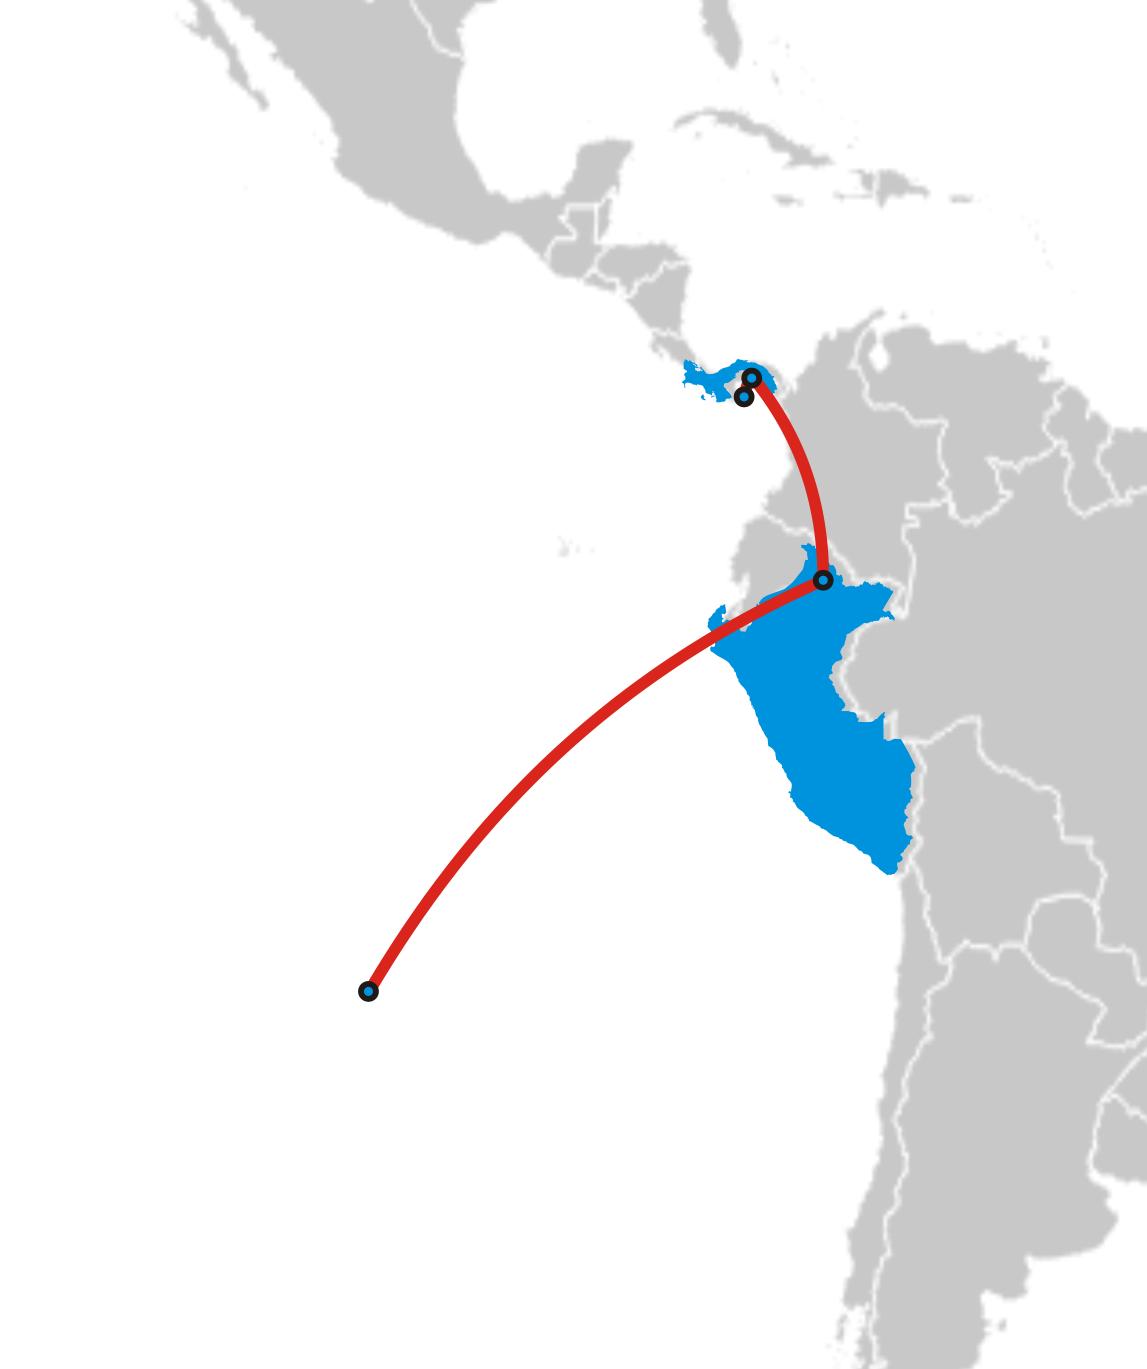 File Travesia Uncharted El Tesoro De Drake Png Wikimedia Commons